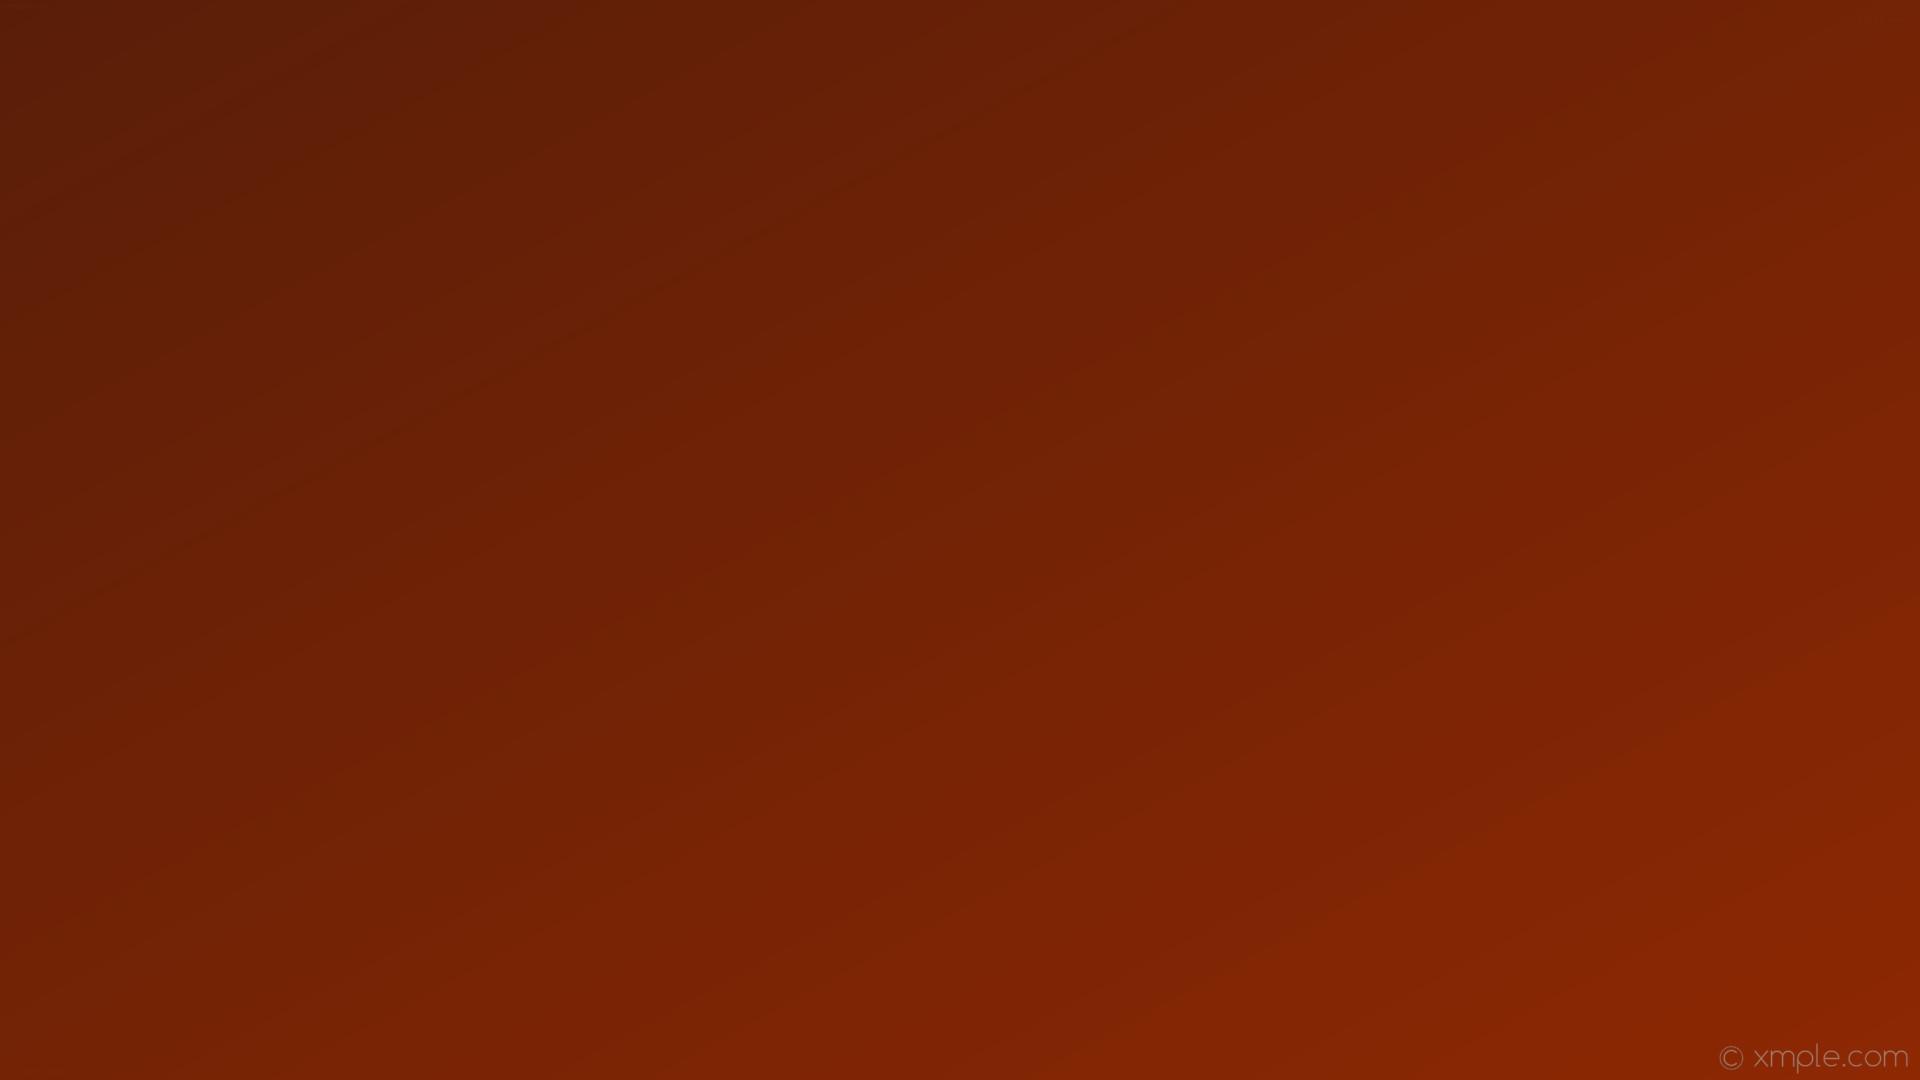 wallpaper gradient linear orange dark orange #5a1e08 #8d2803 150°